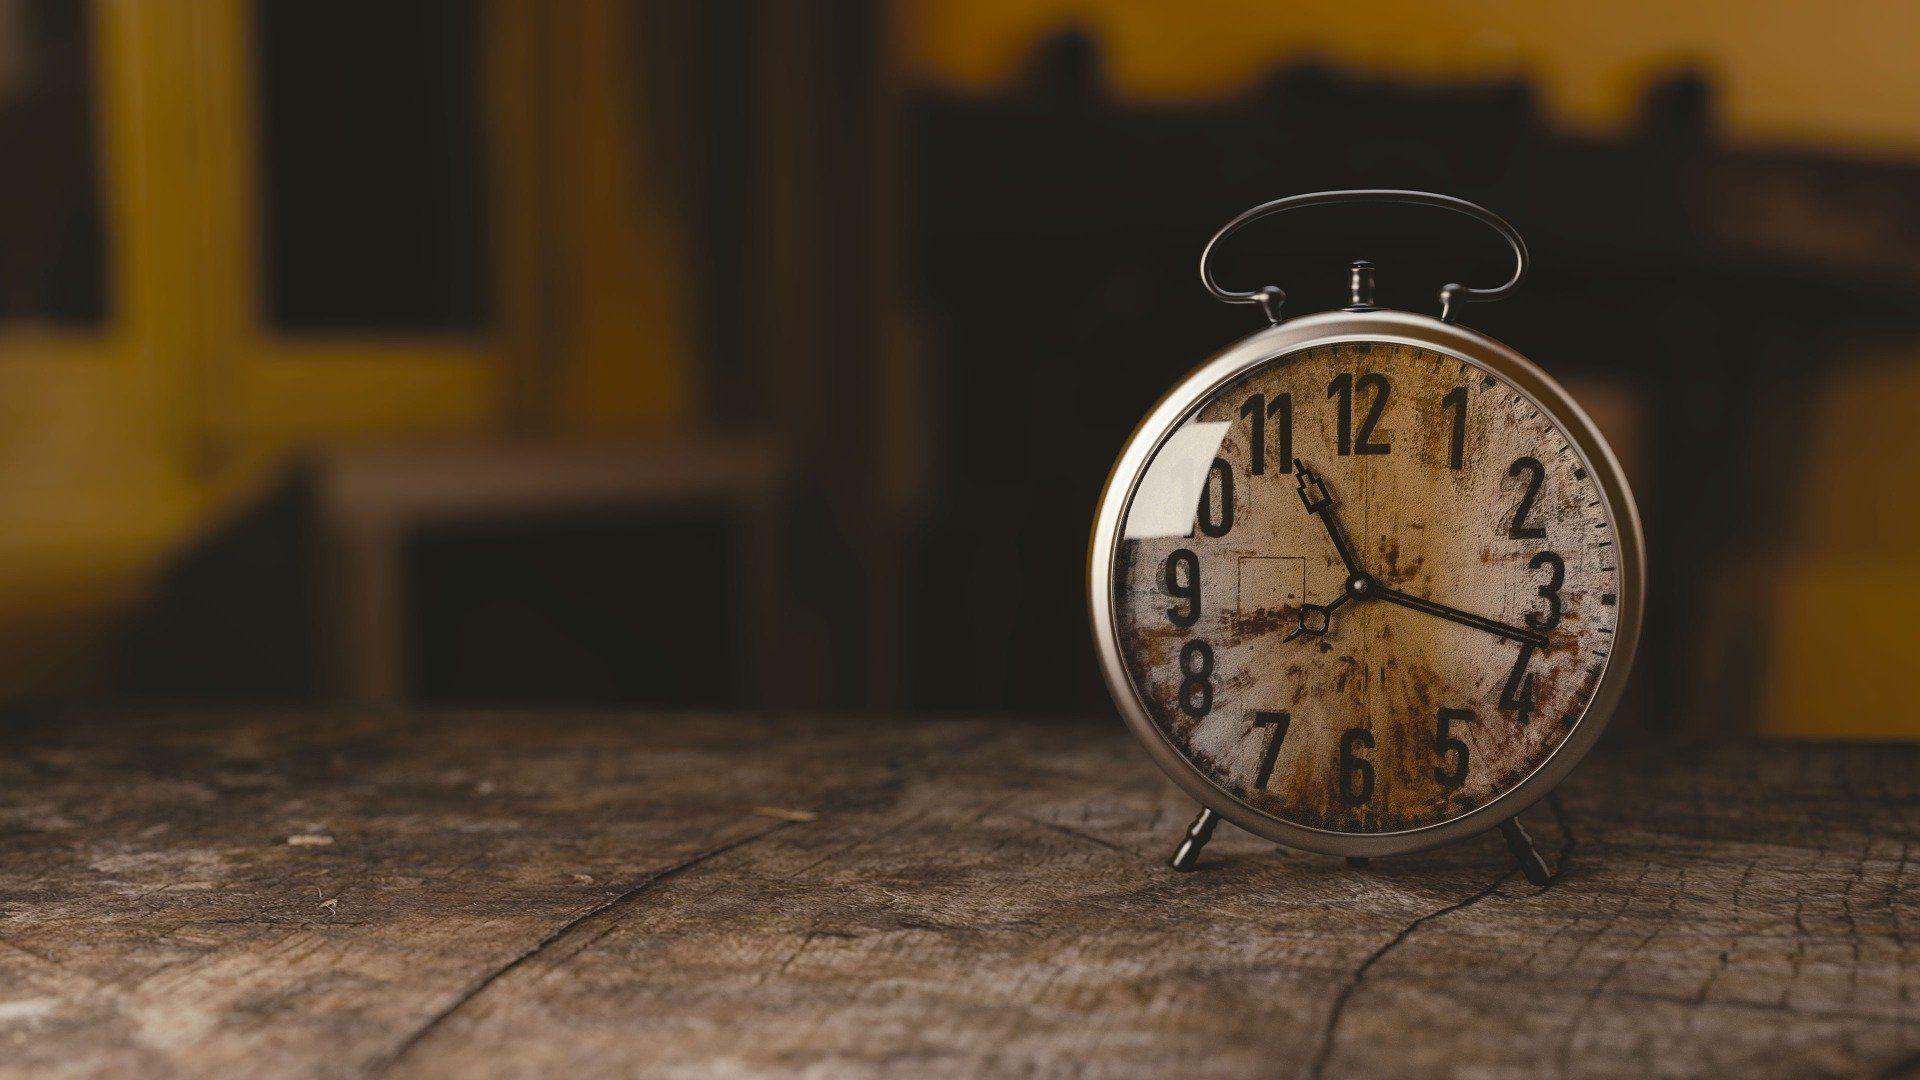 Holding On Property in 2020 Clock, Alarm clock, Old clocks